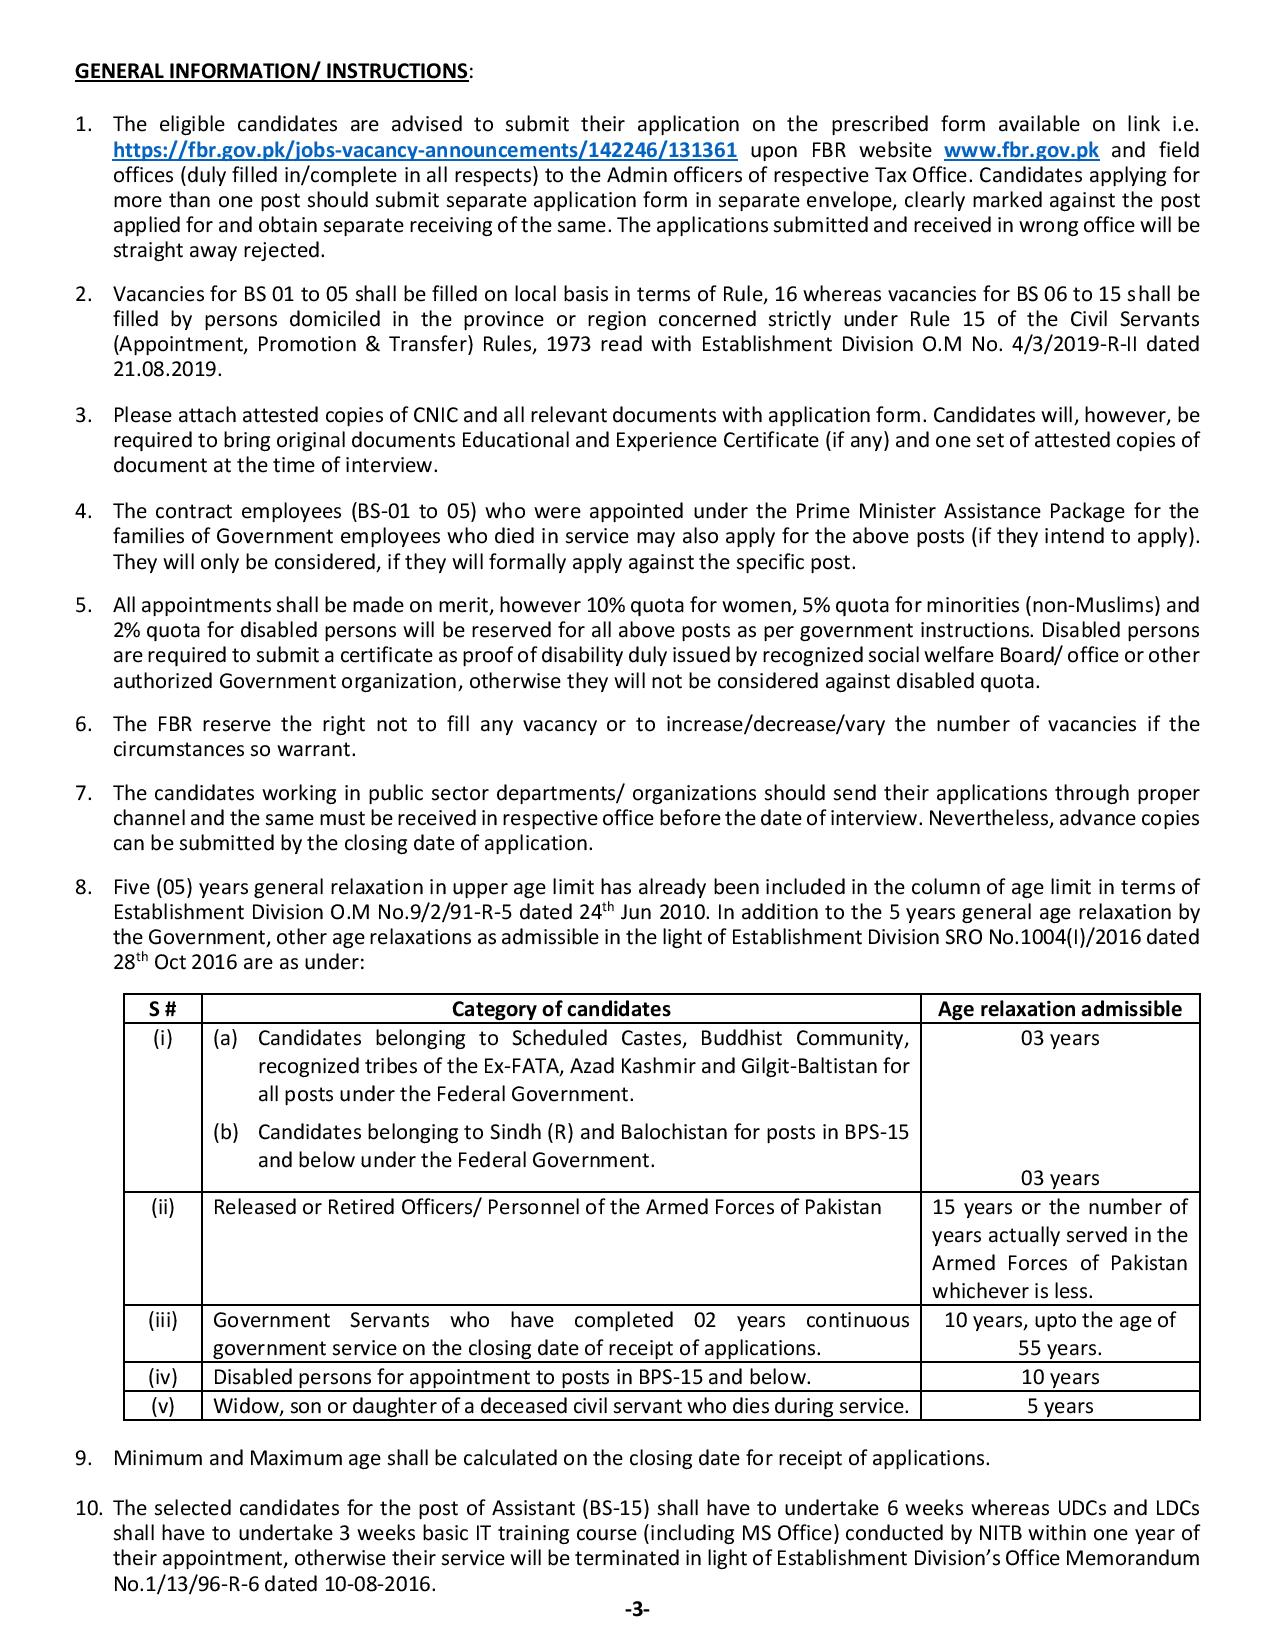 Federal Revenue Board - FBR Jobs Advertisement Latest 2021